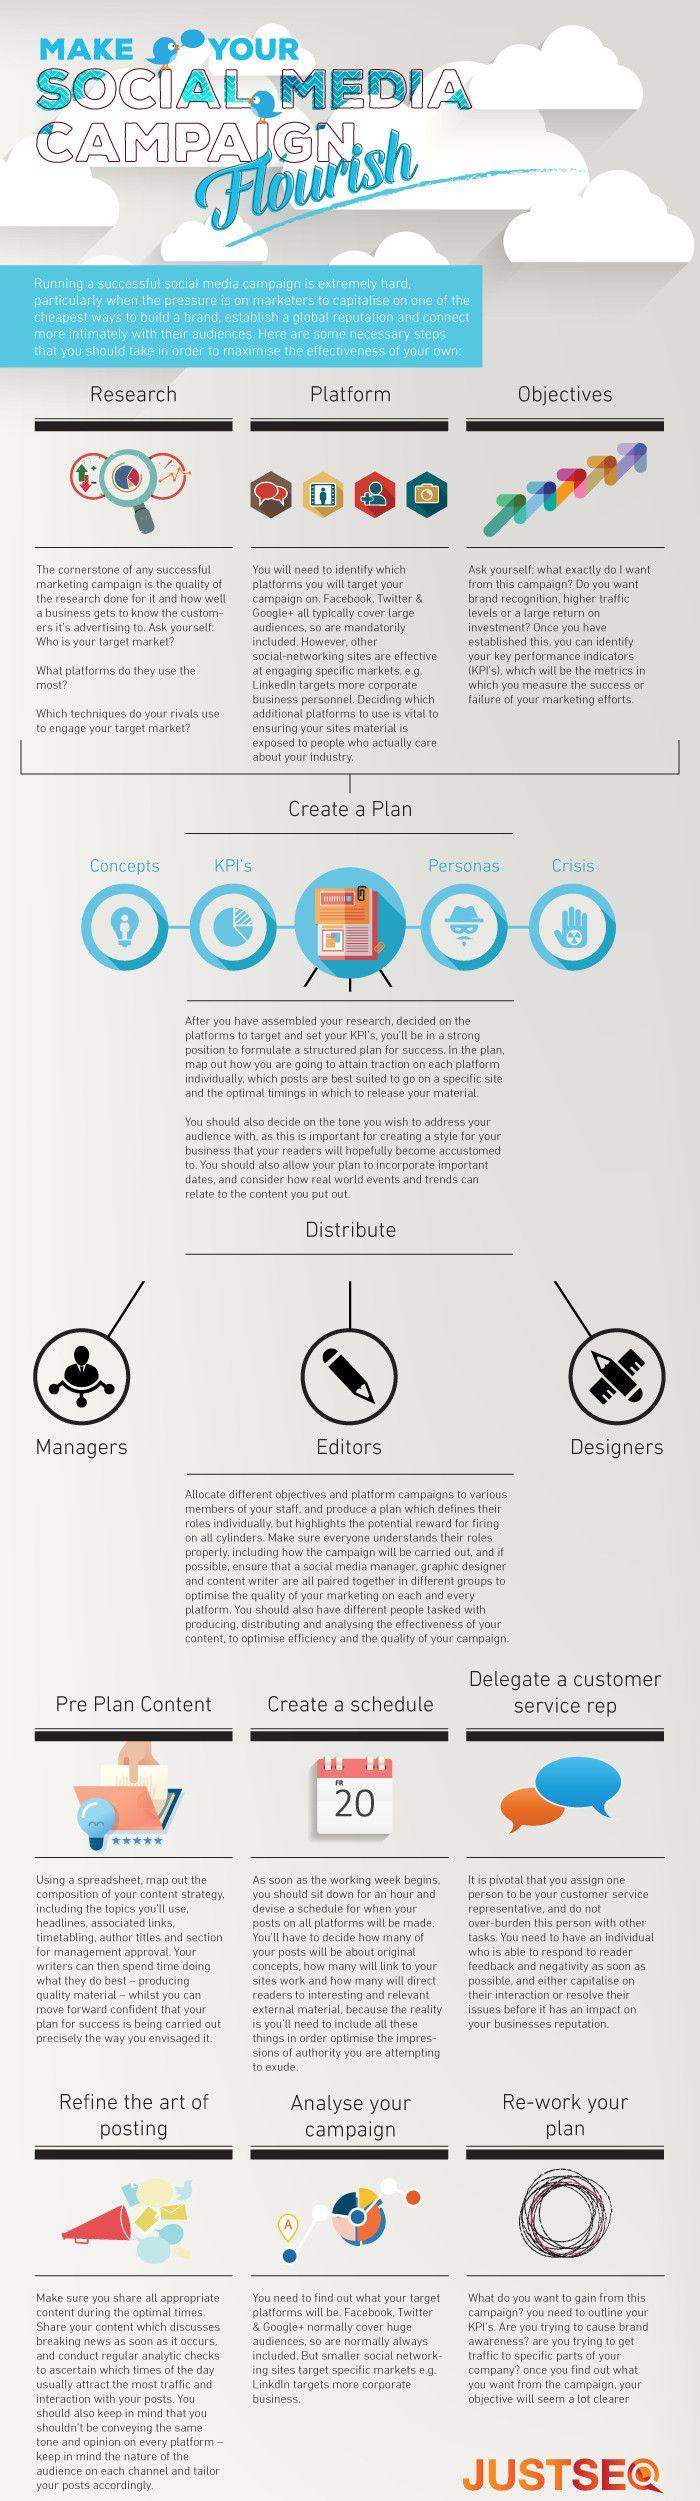 How To Make Your Socialmedia Marketing Campaign Flourish